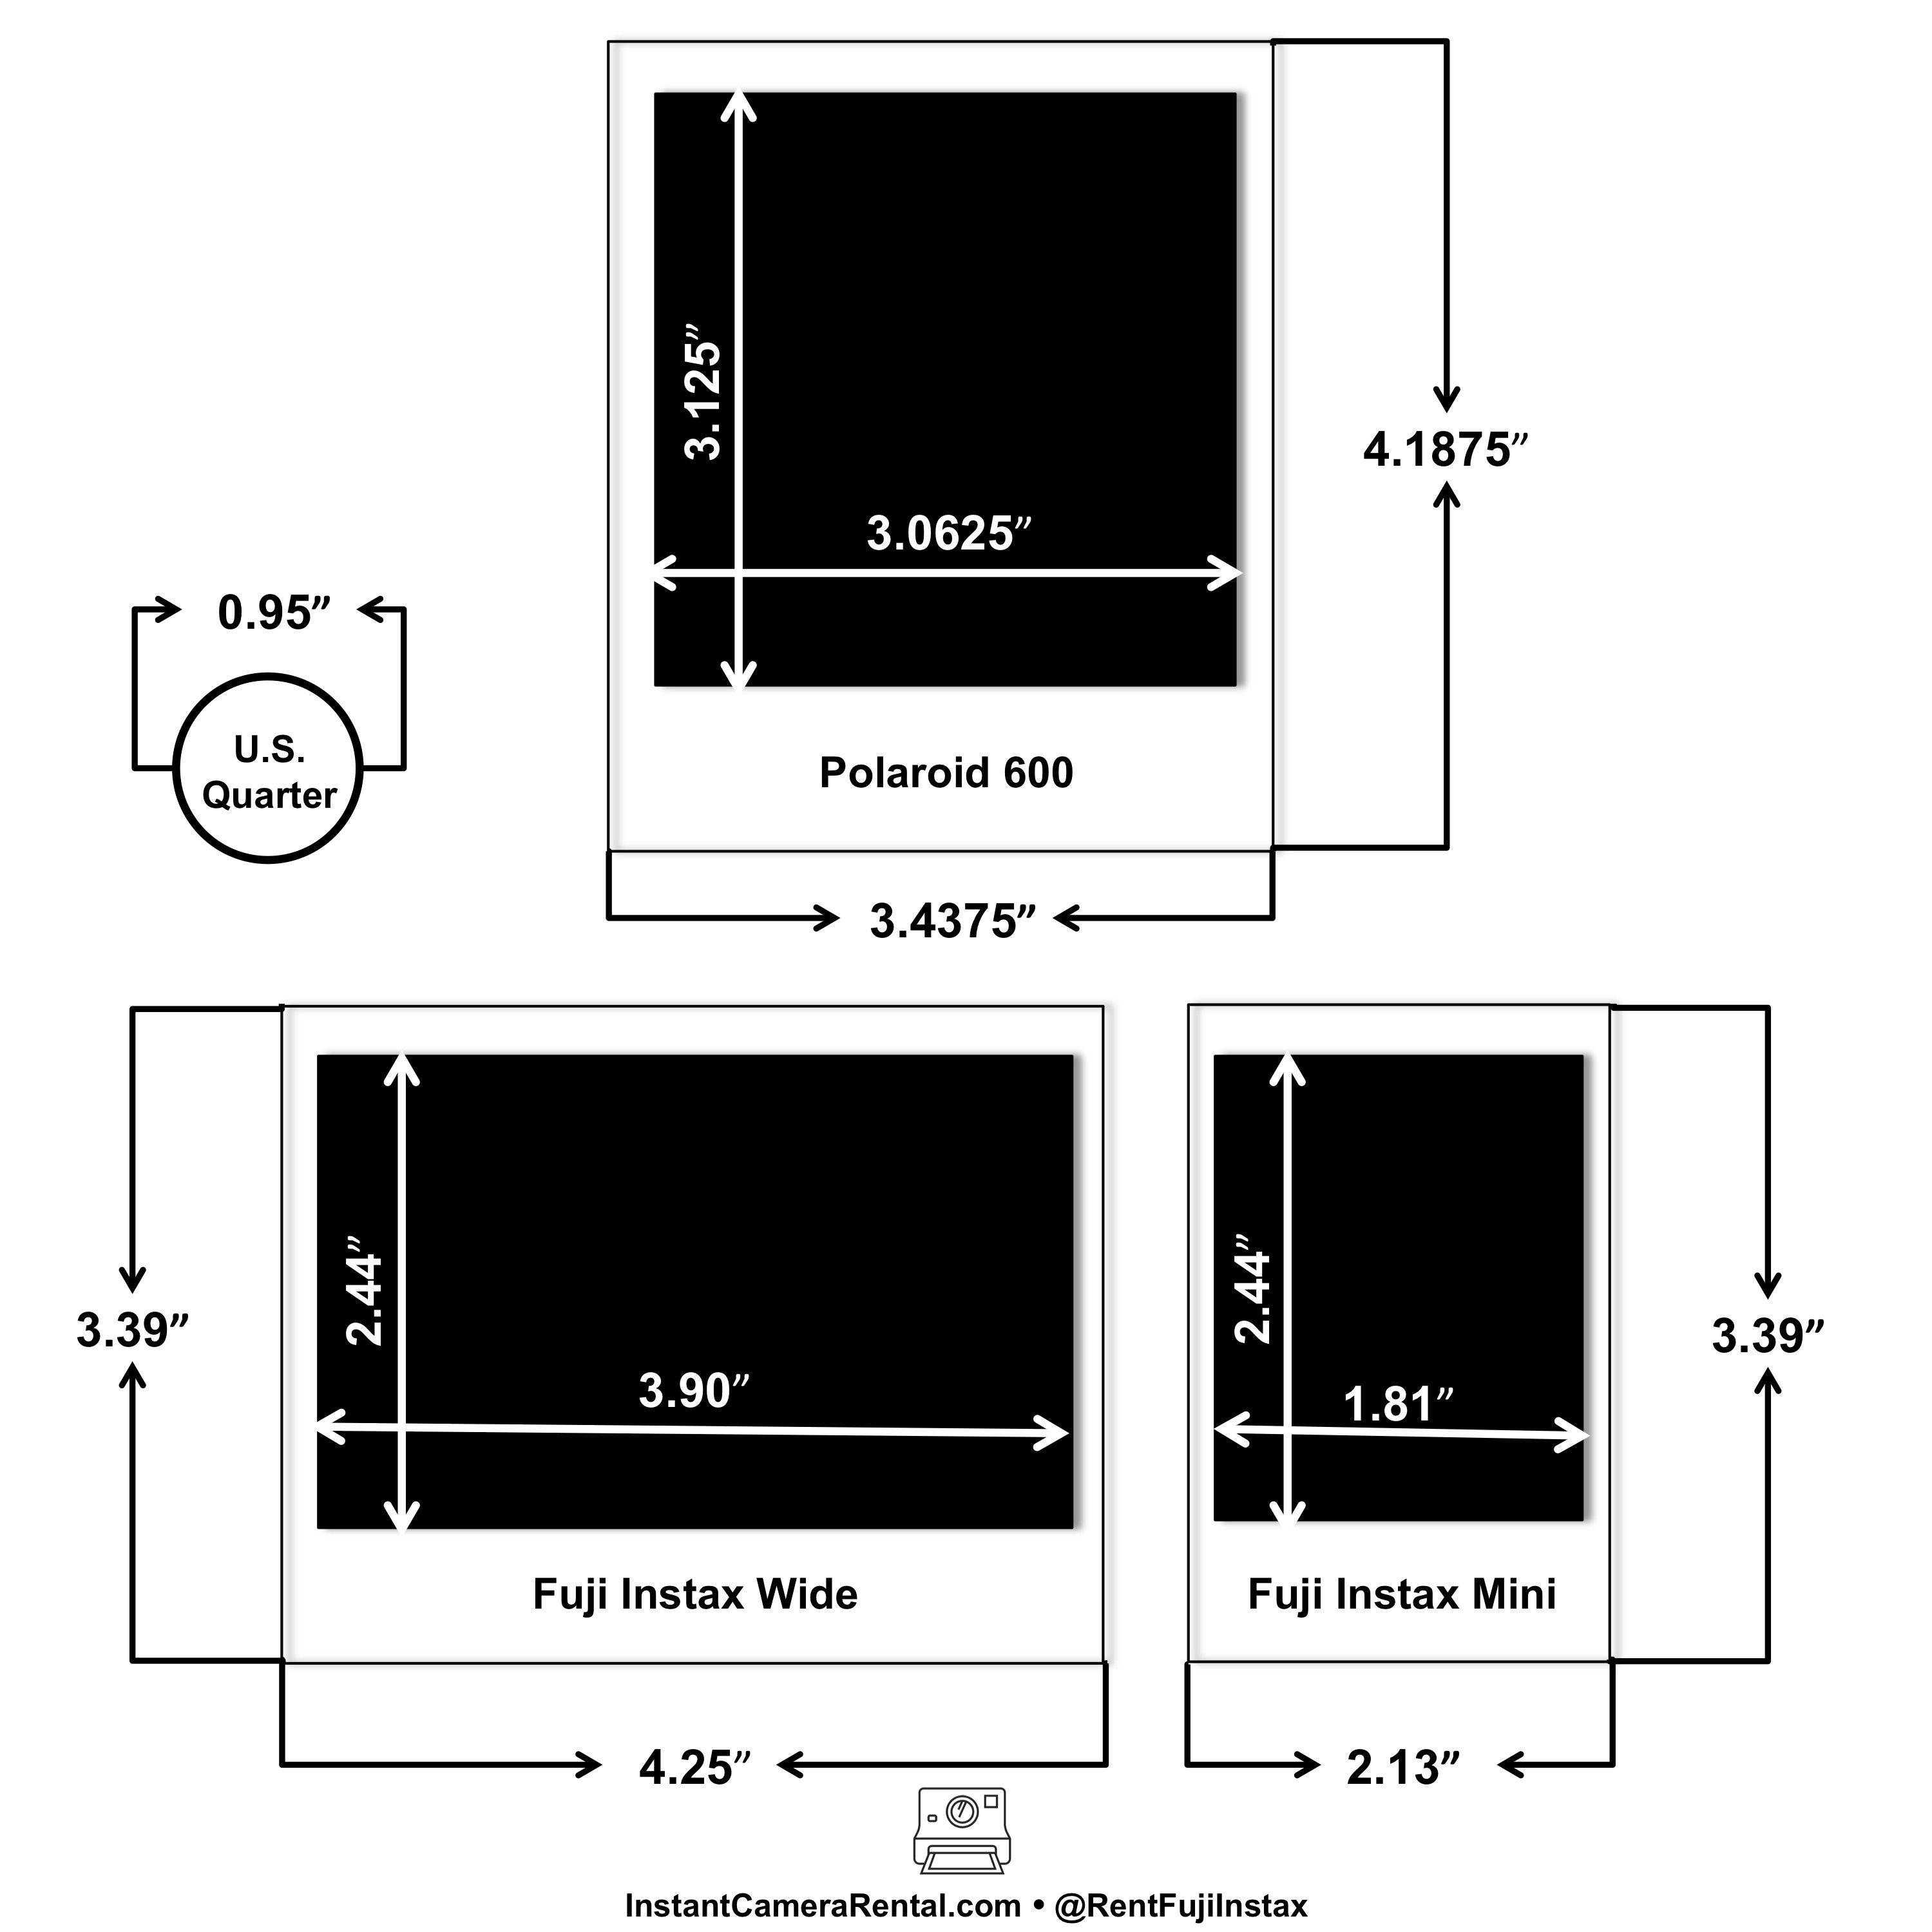 Fuji Instax Photo Size Mini Vs Wide Vs Polaroid Visit